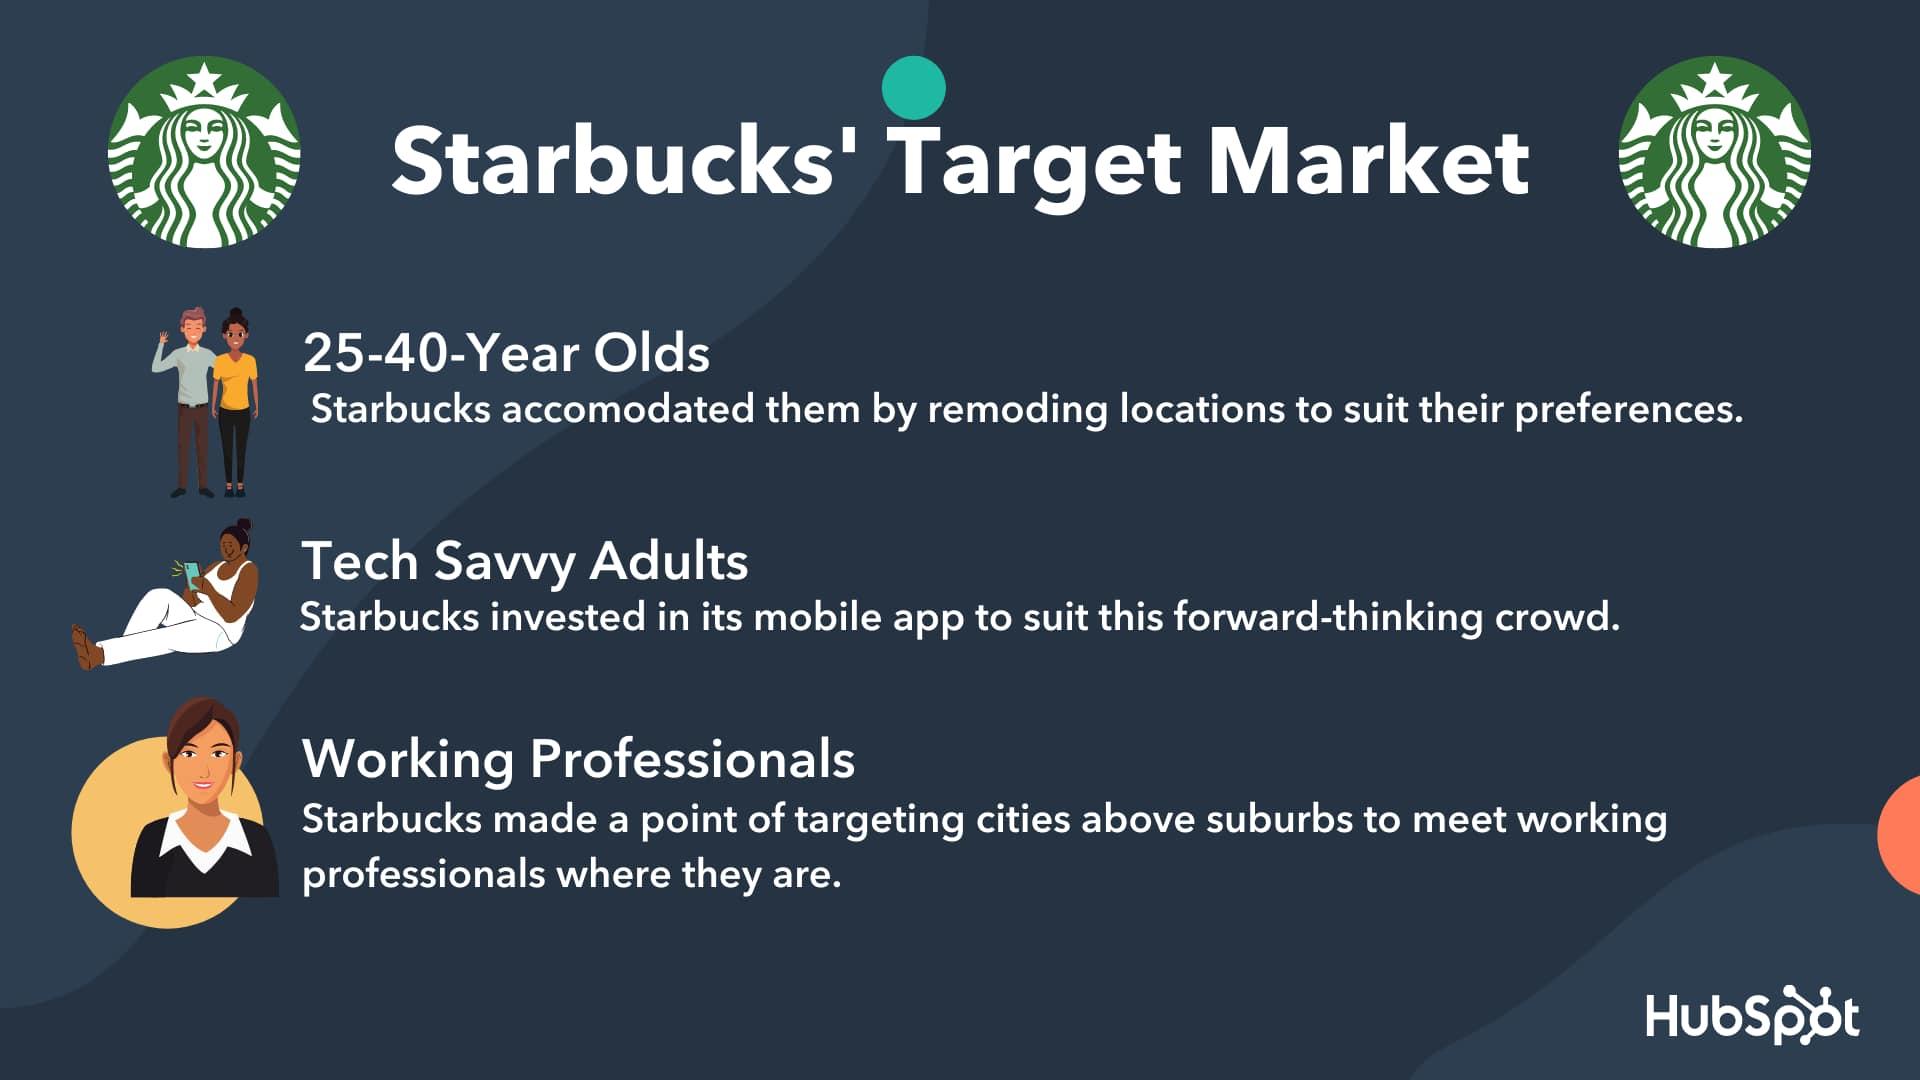 Starbucks target market